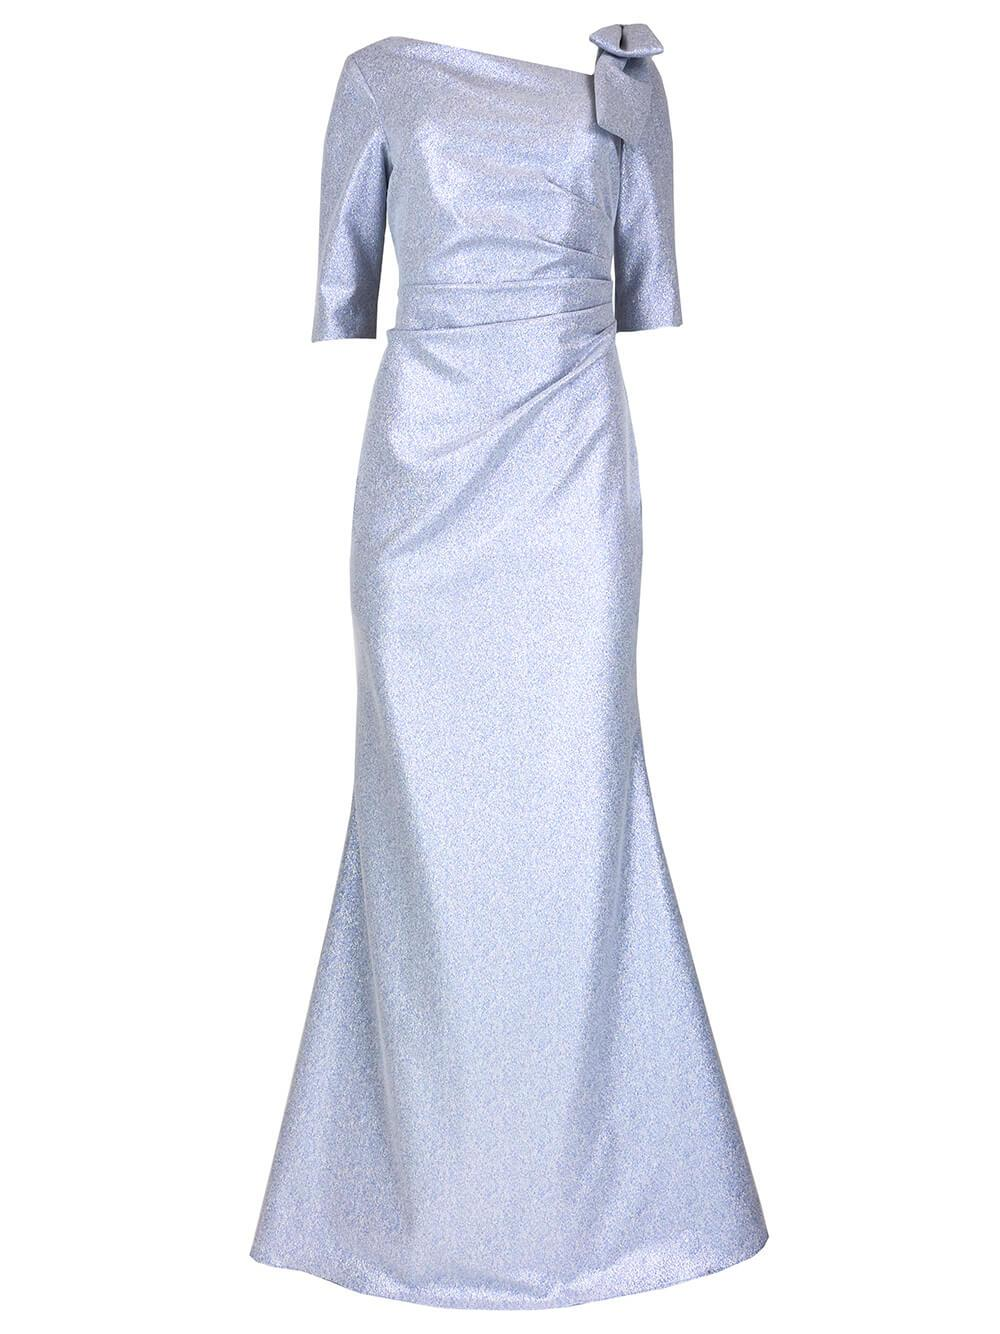 Bow Shoulder Detail Gown Item # 219036